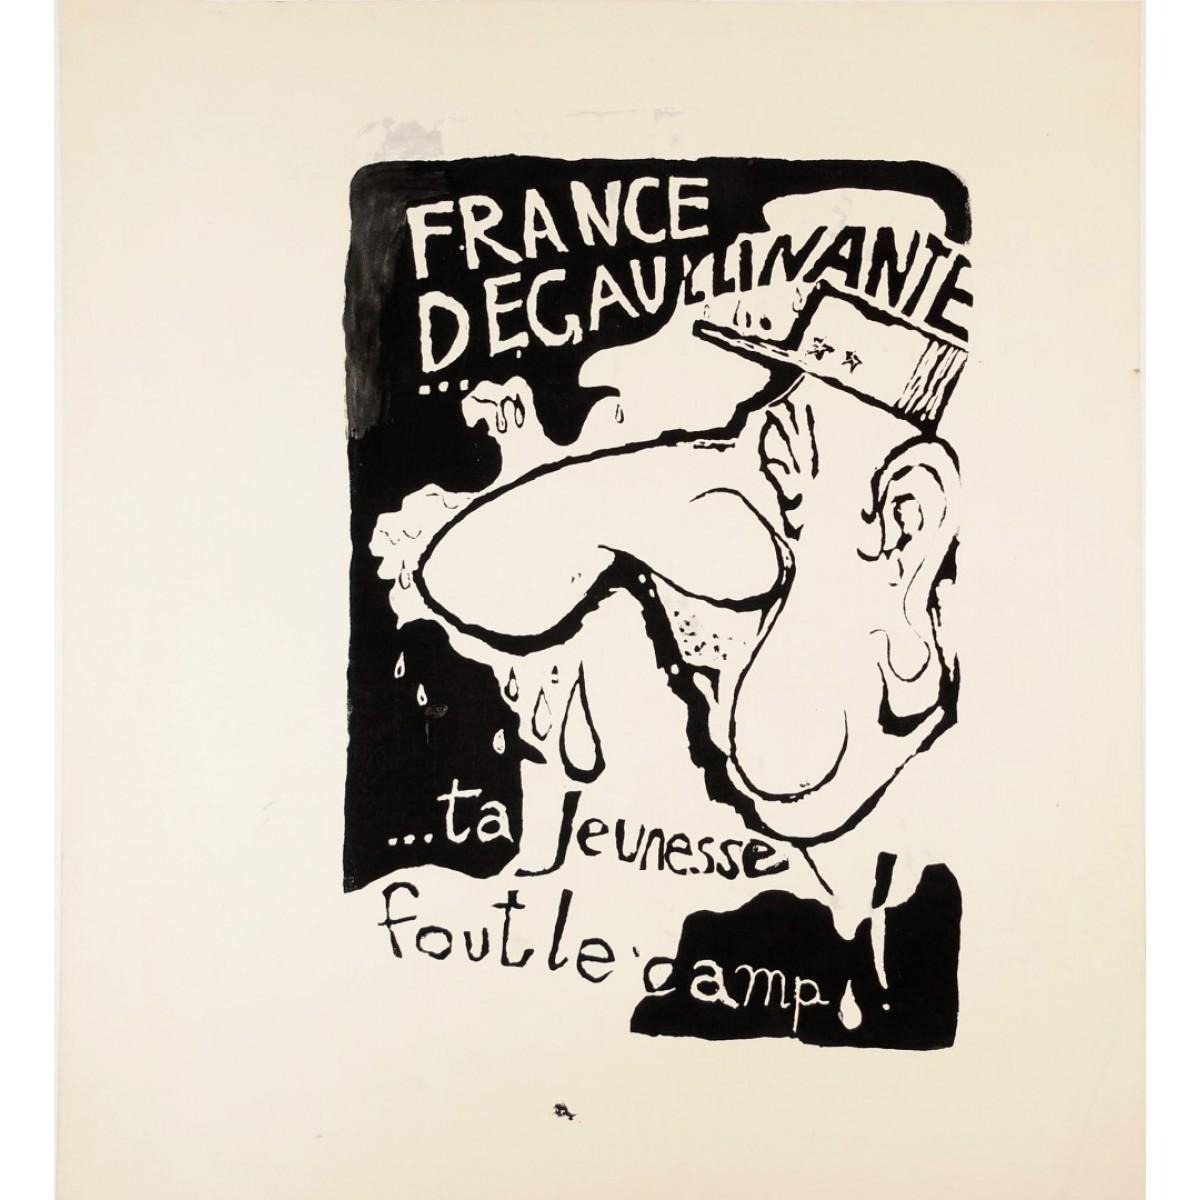 $650.00 - Original Vintage French 1968 Student Revolution Poster ...